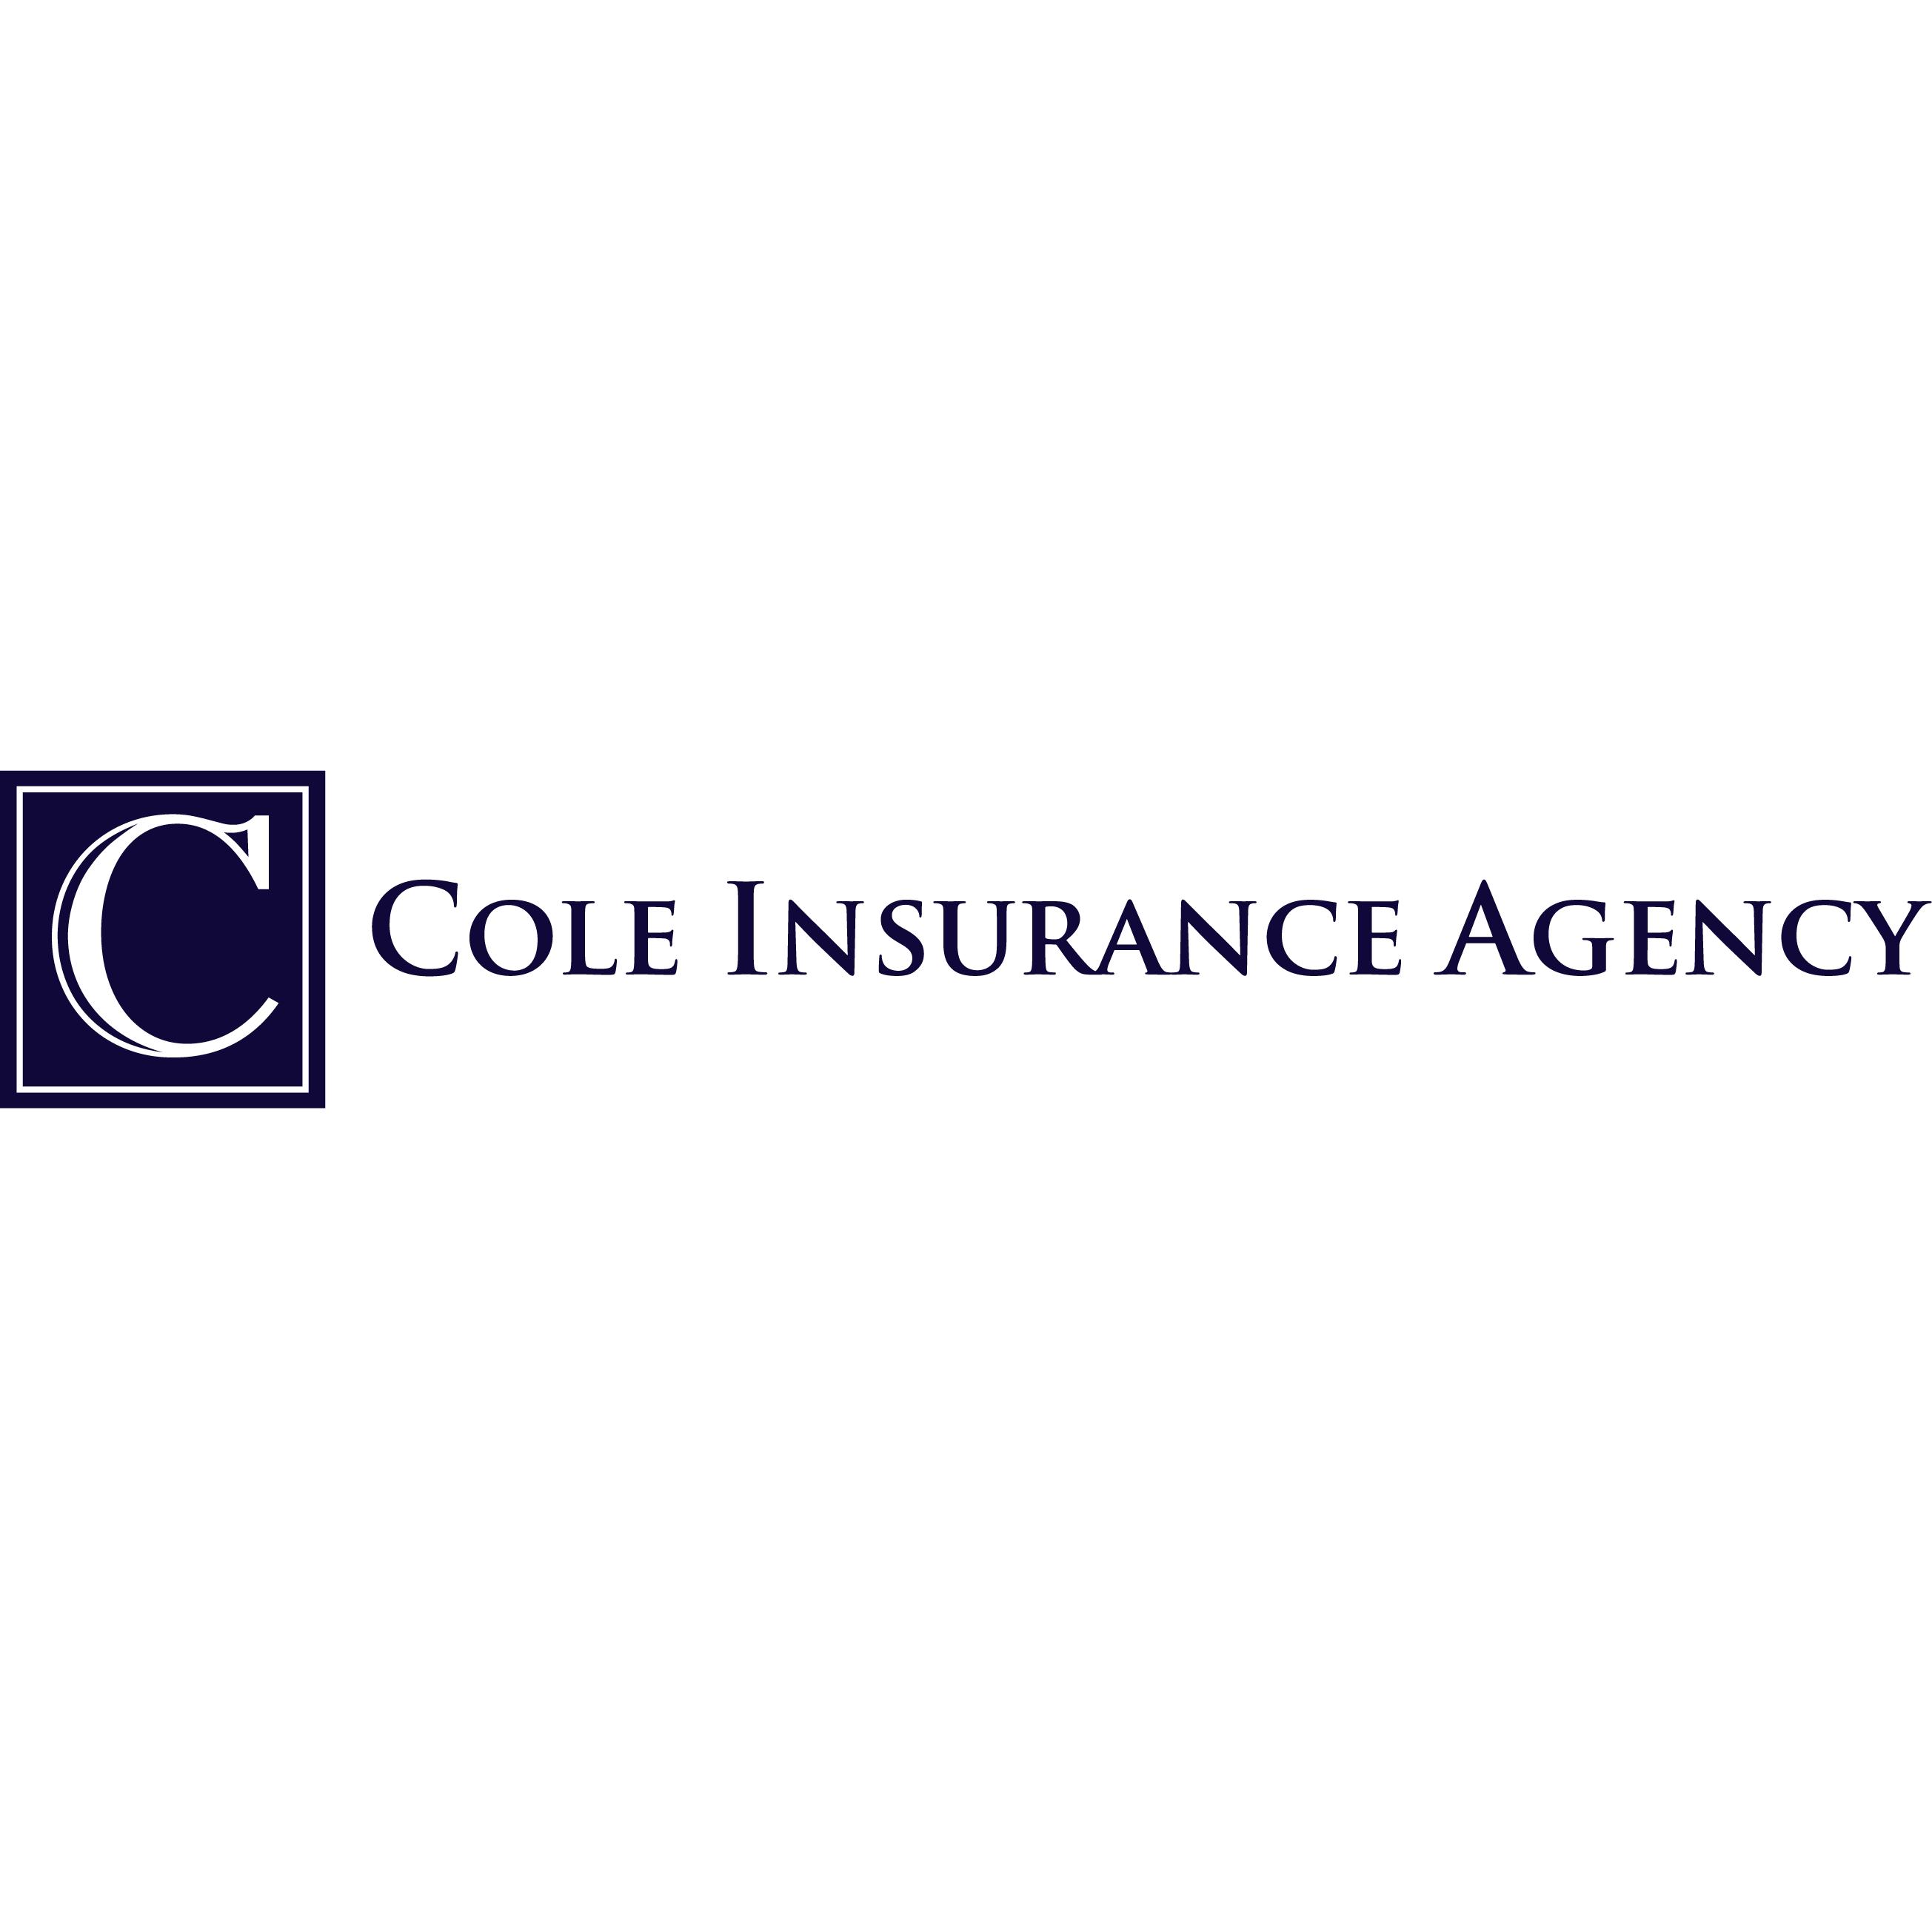 Cole Insurance Agency